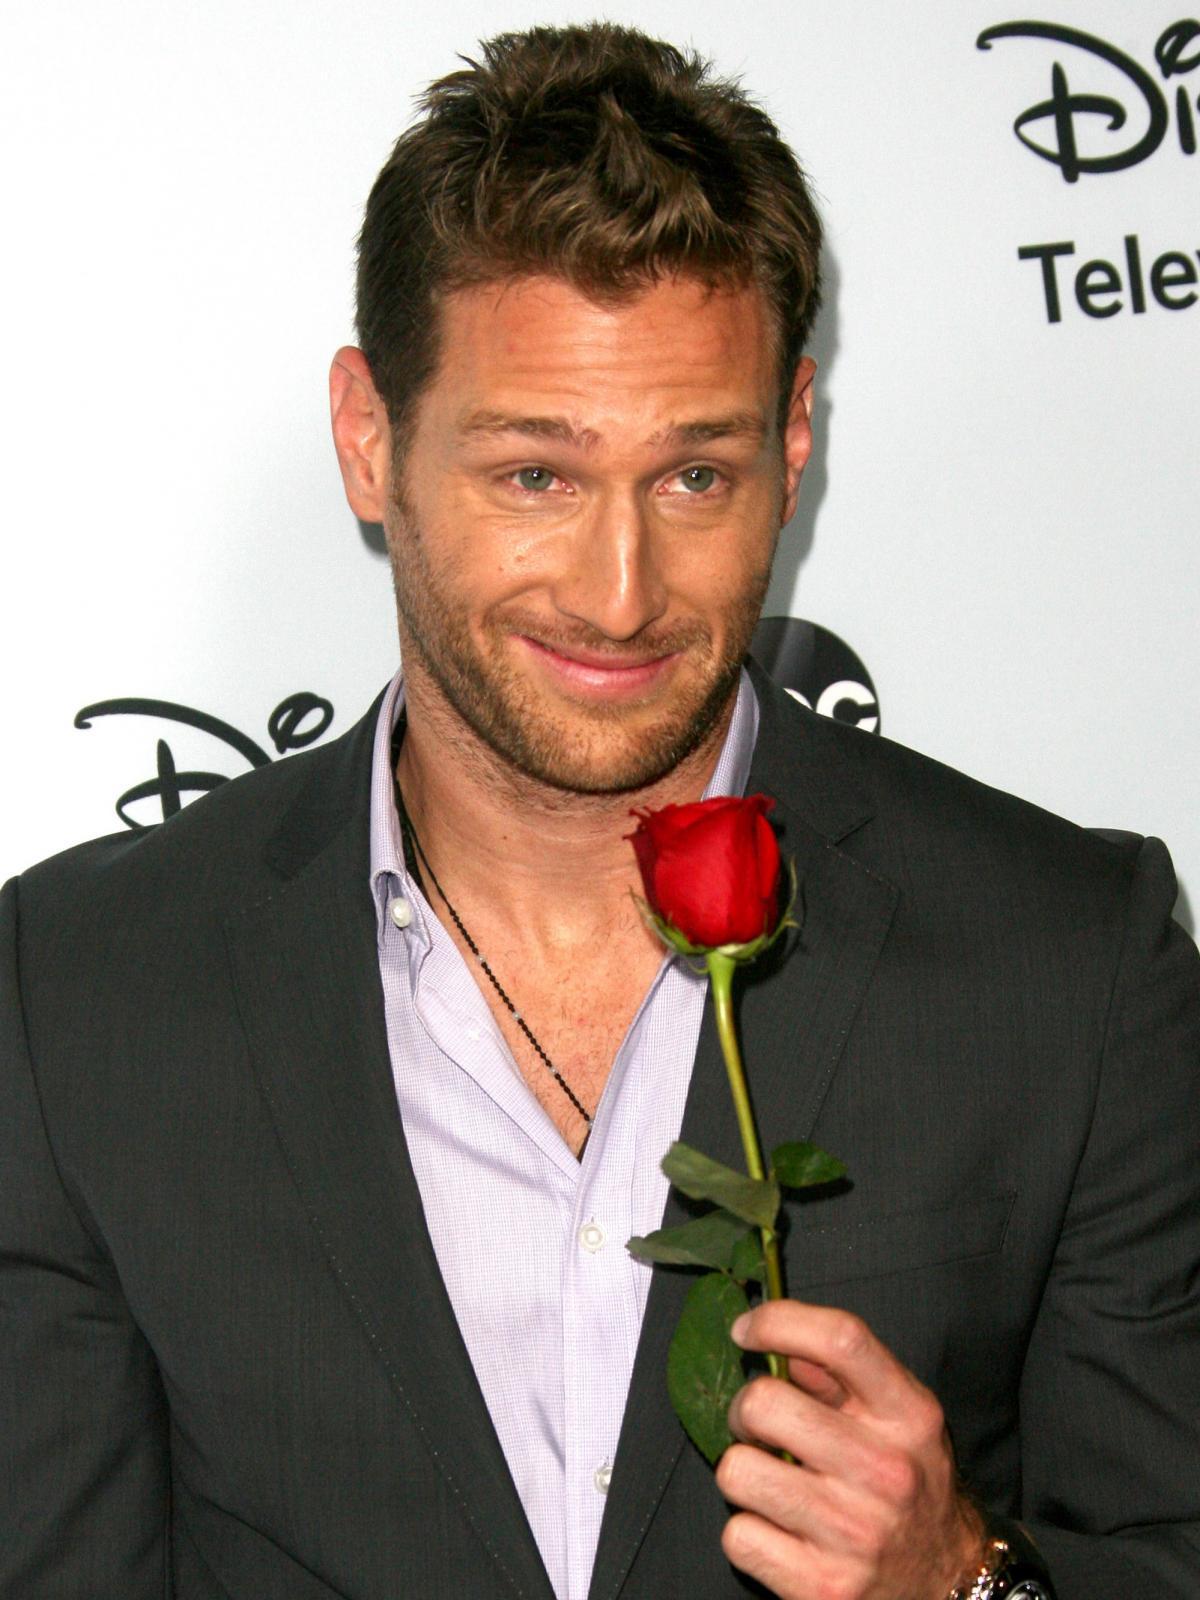 The second-most-recent Bachelor, Juan Pablo Galavis.